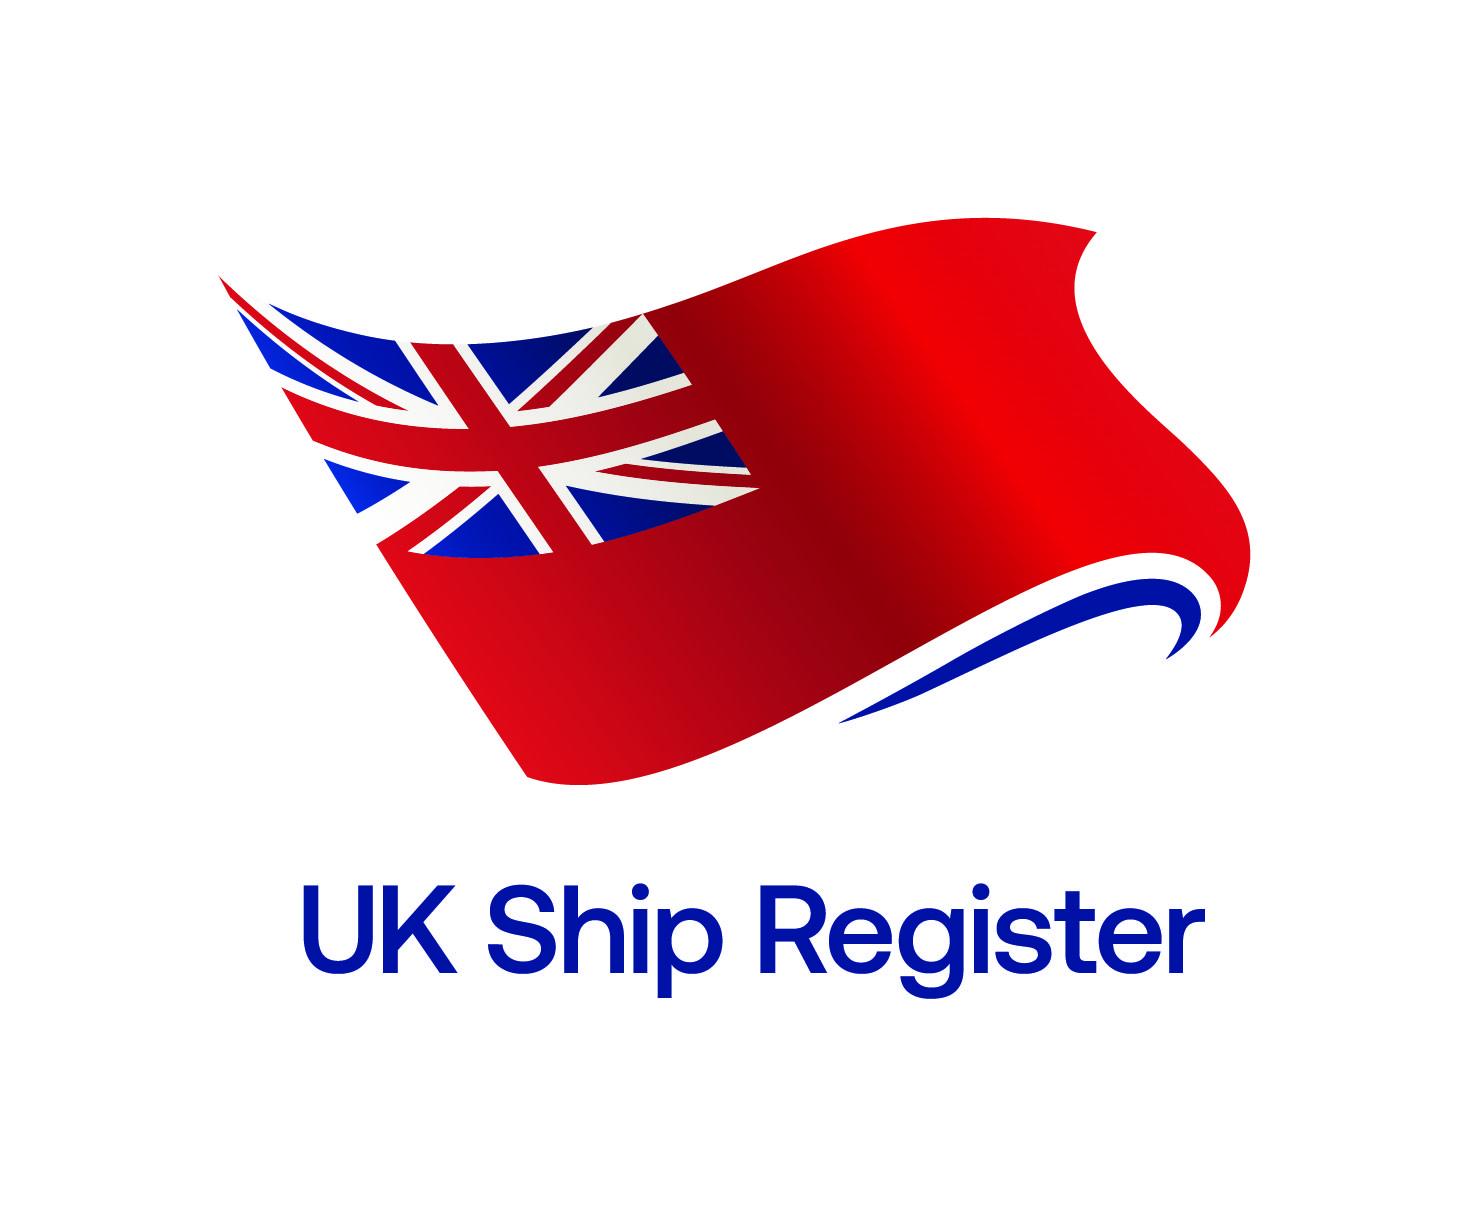 UK Ship Register logo,  red flag with union jack i